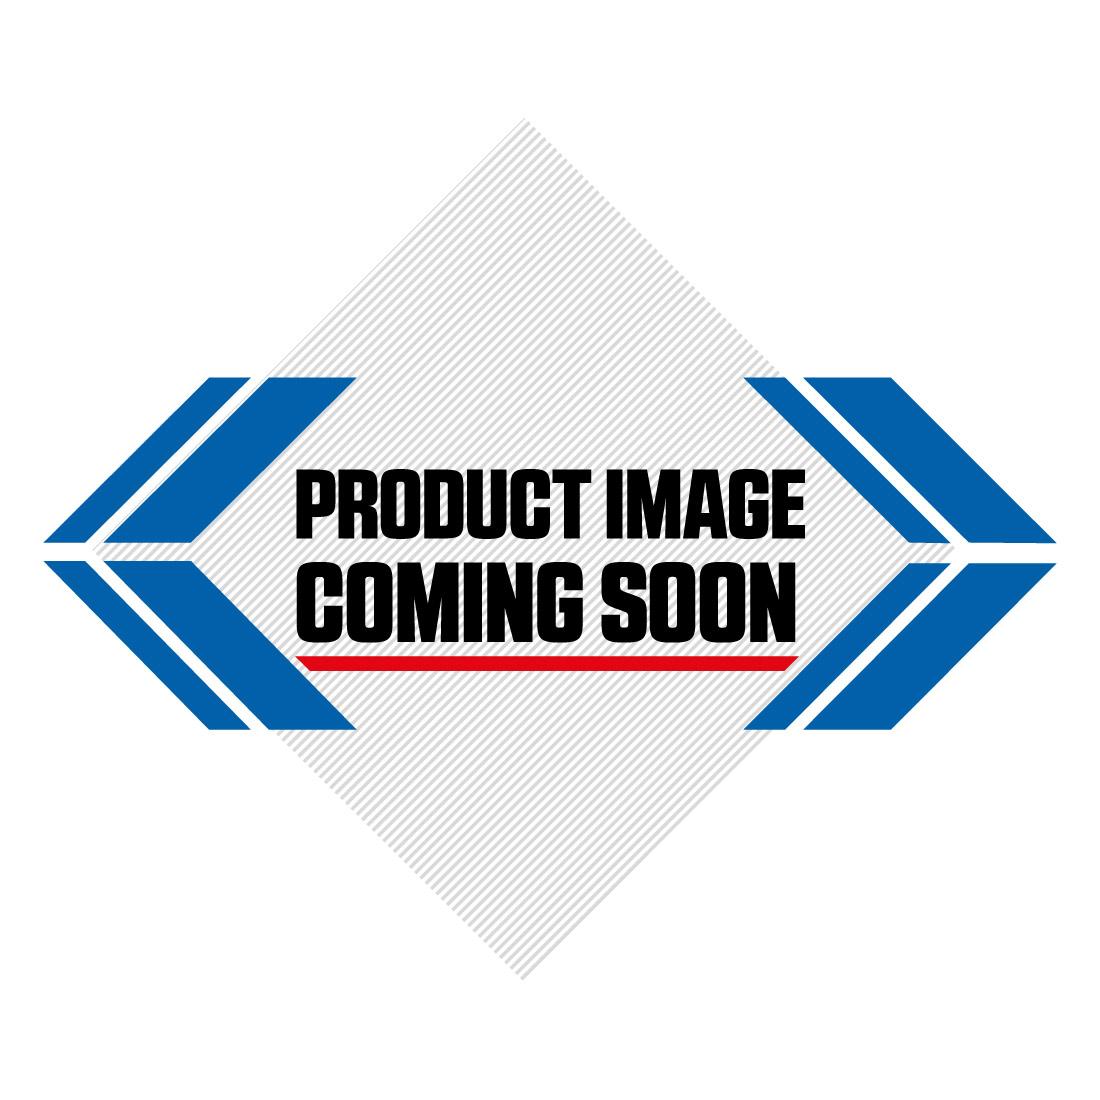 DJI Mavic 2 Pro Drone Image-5